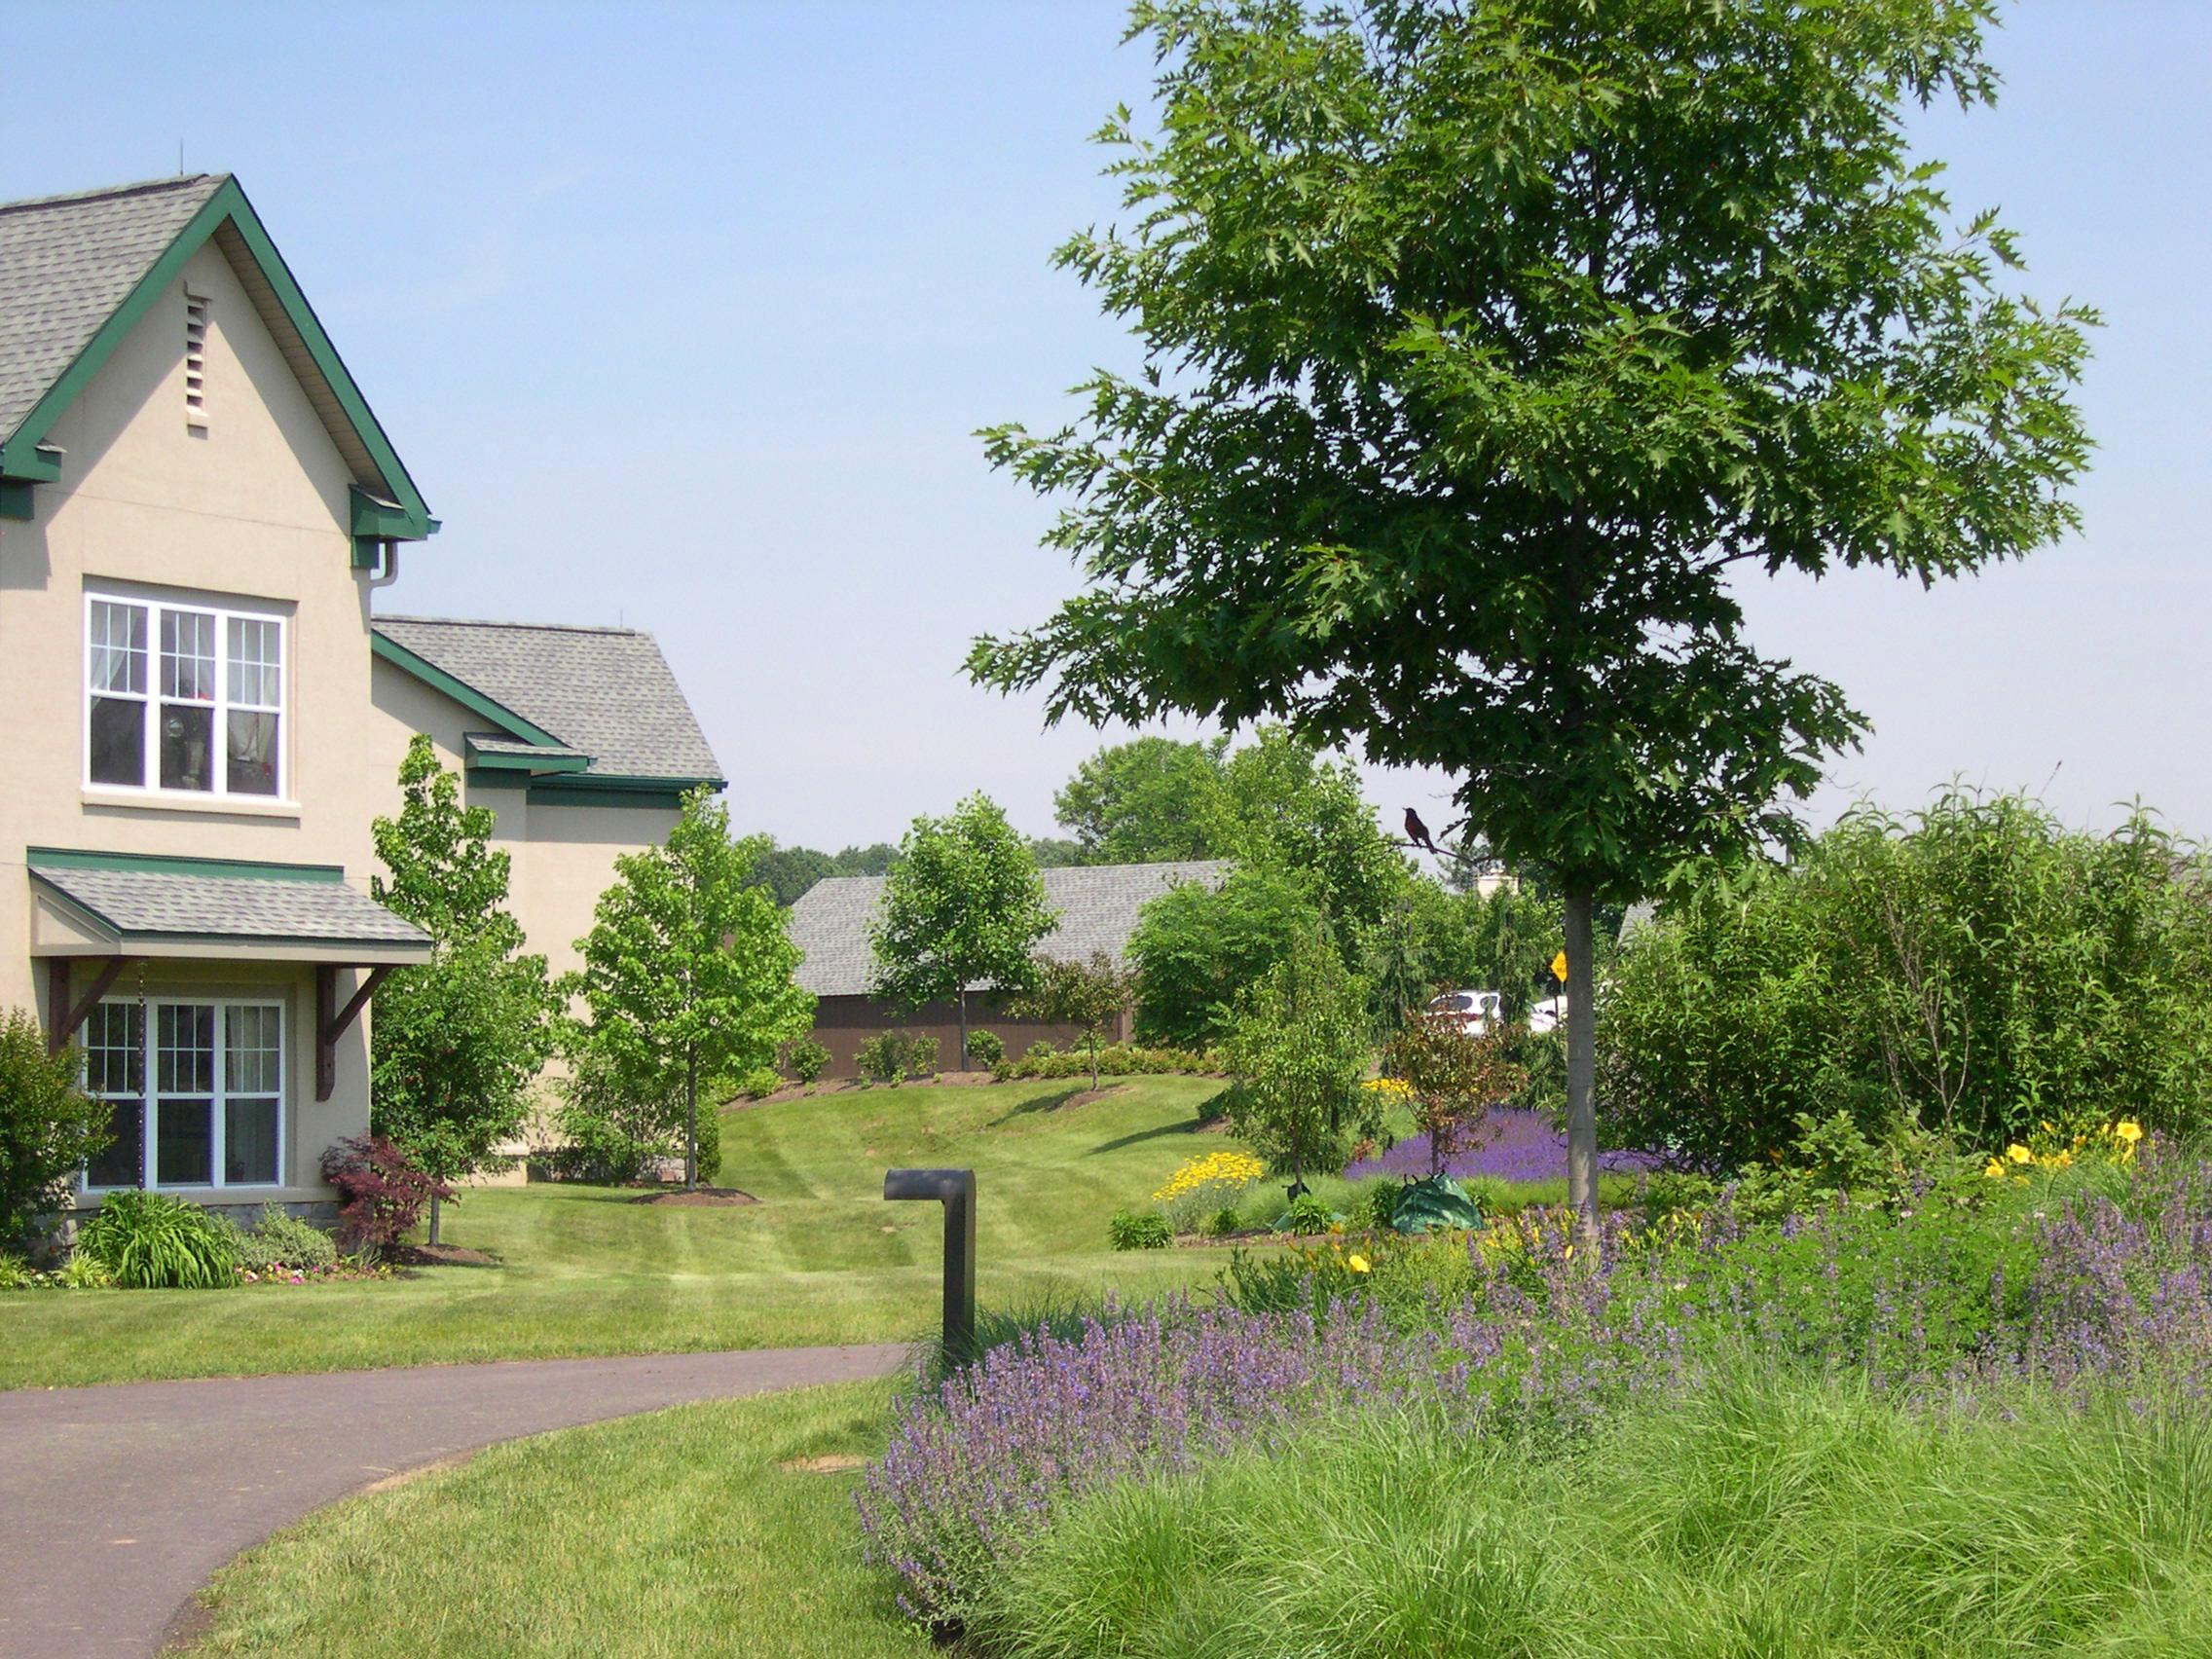 Pennswood-Gardens1.jpg